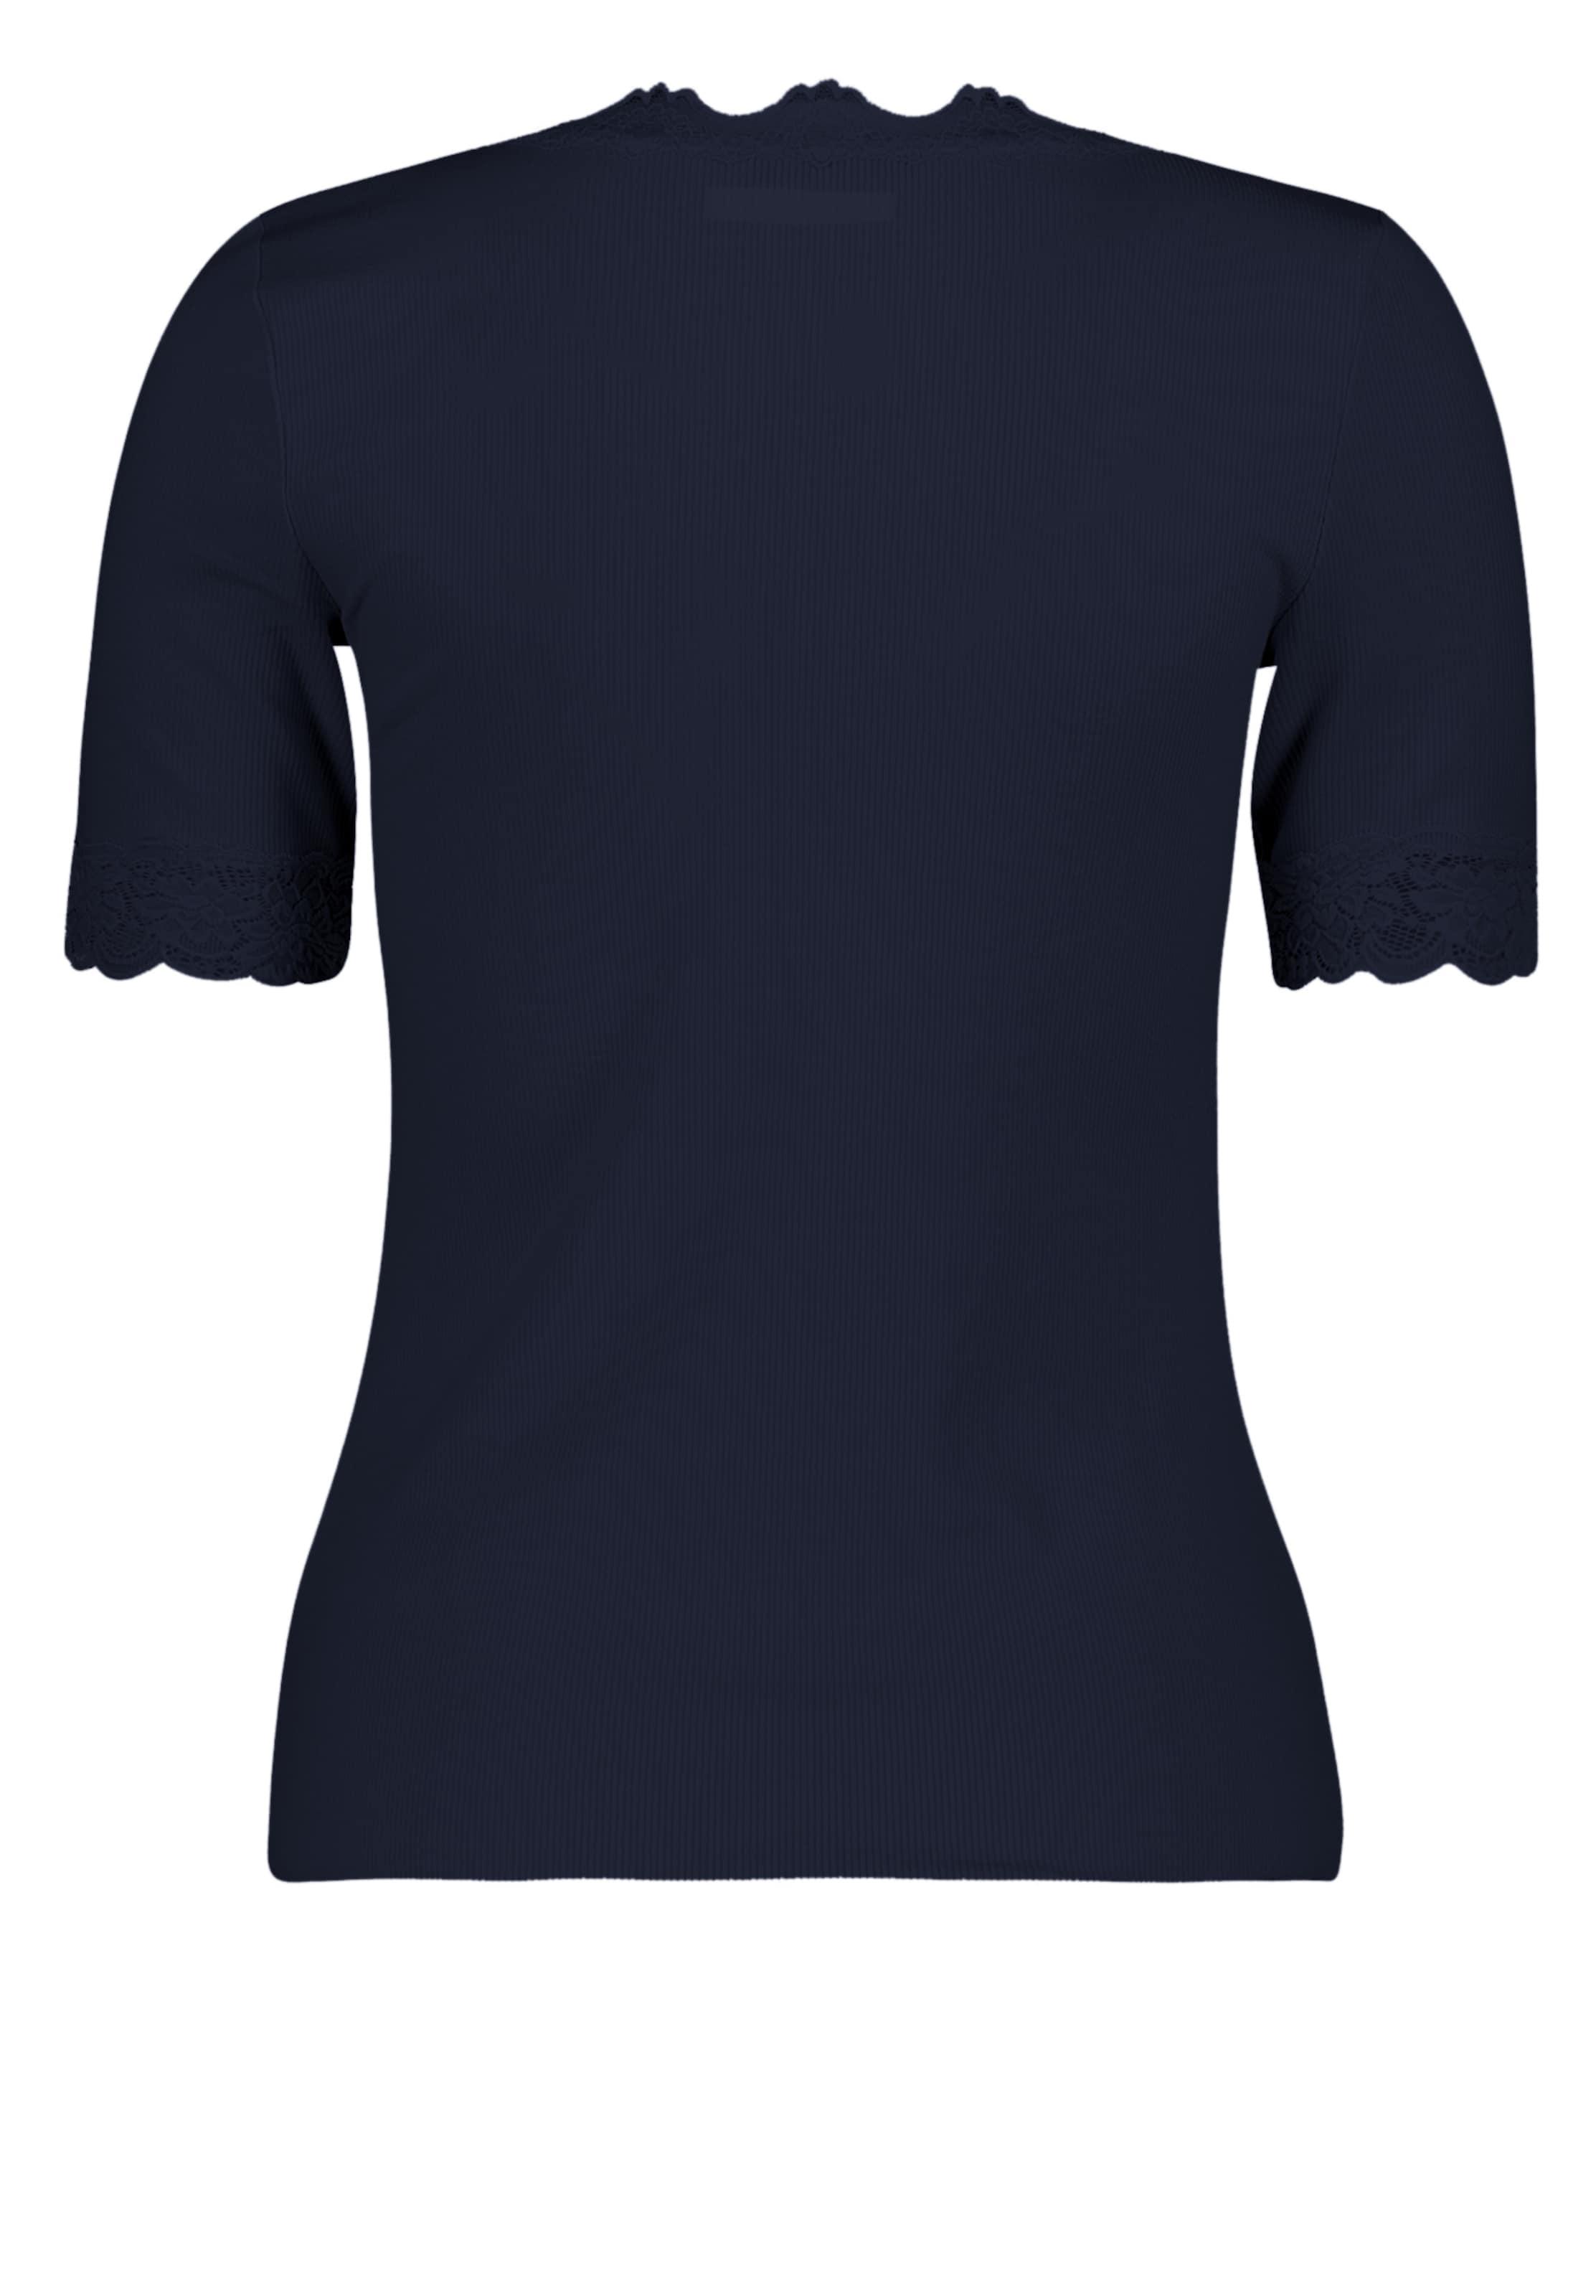 Shirt Betty In In Shirt Betty Barclay Dunkelblau Barclay txCsrhQd